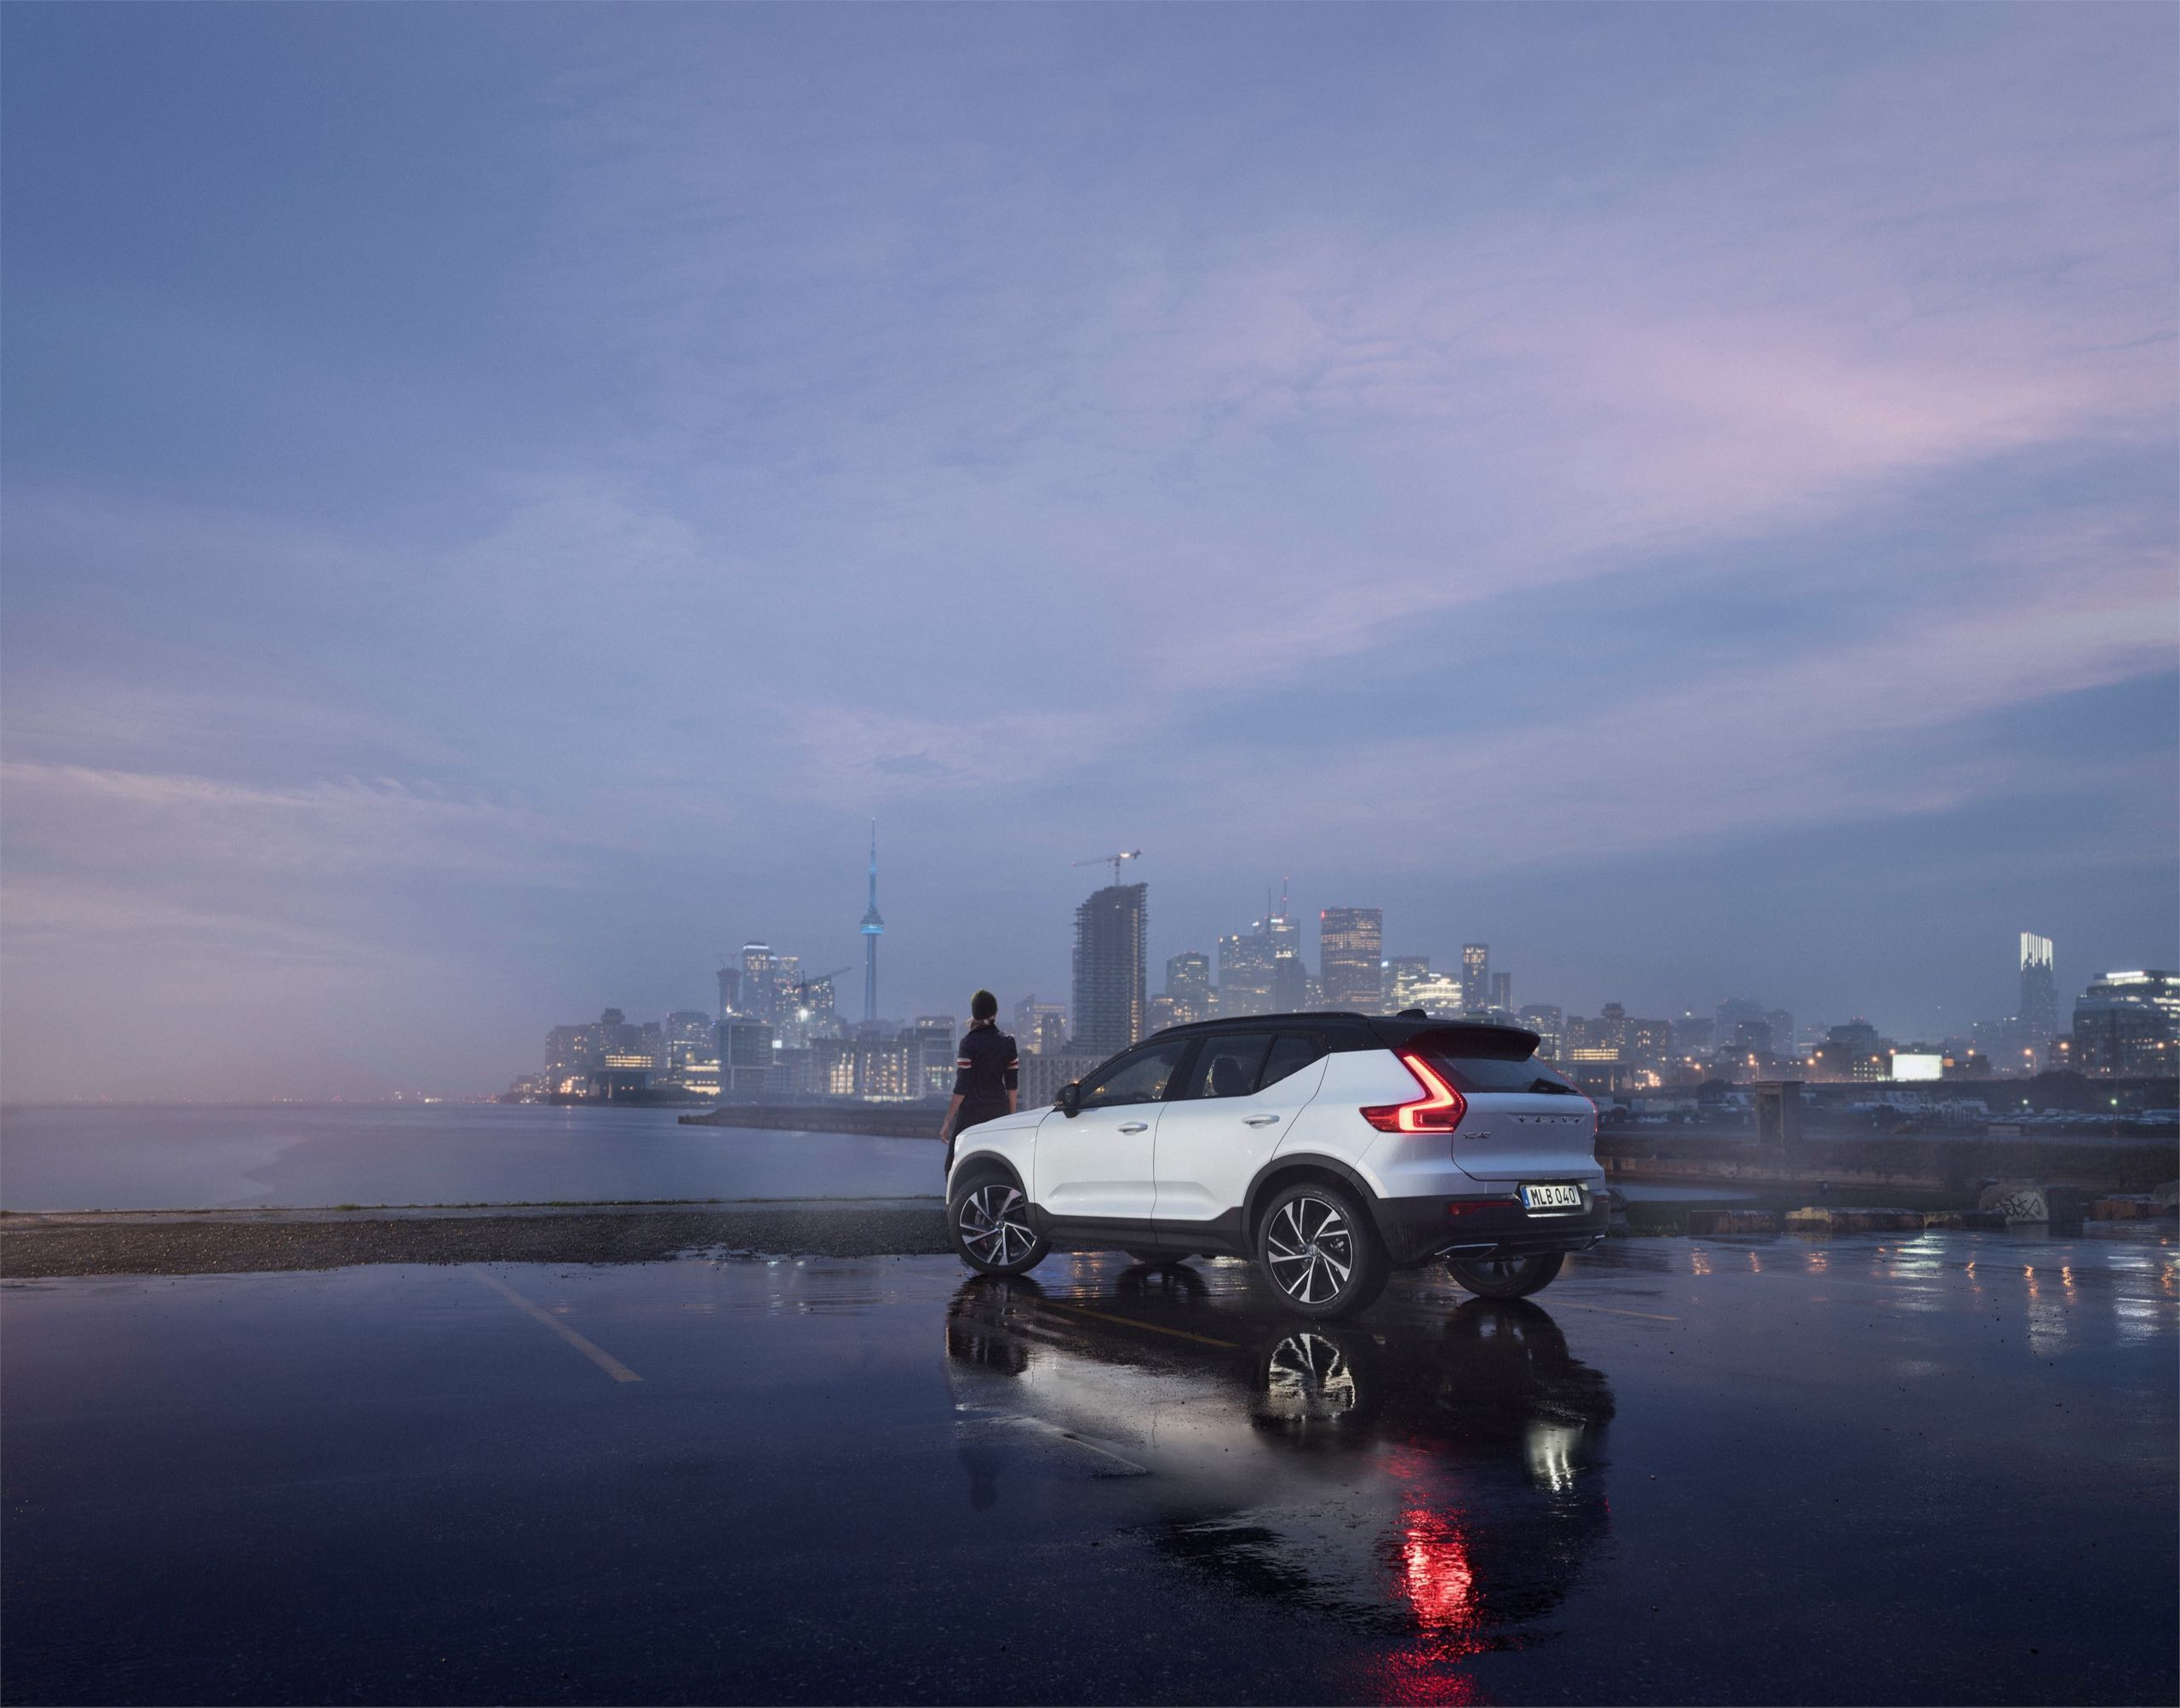 New Volvo XC40 Exterior -  2018, 2018 New XC40, Exterior, Images, New XC40, People, Quality